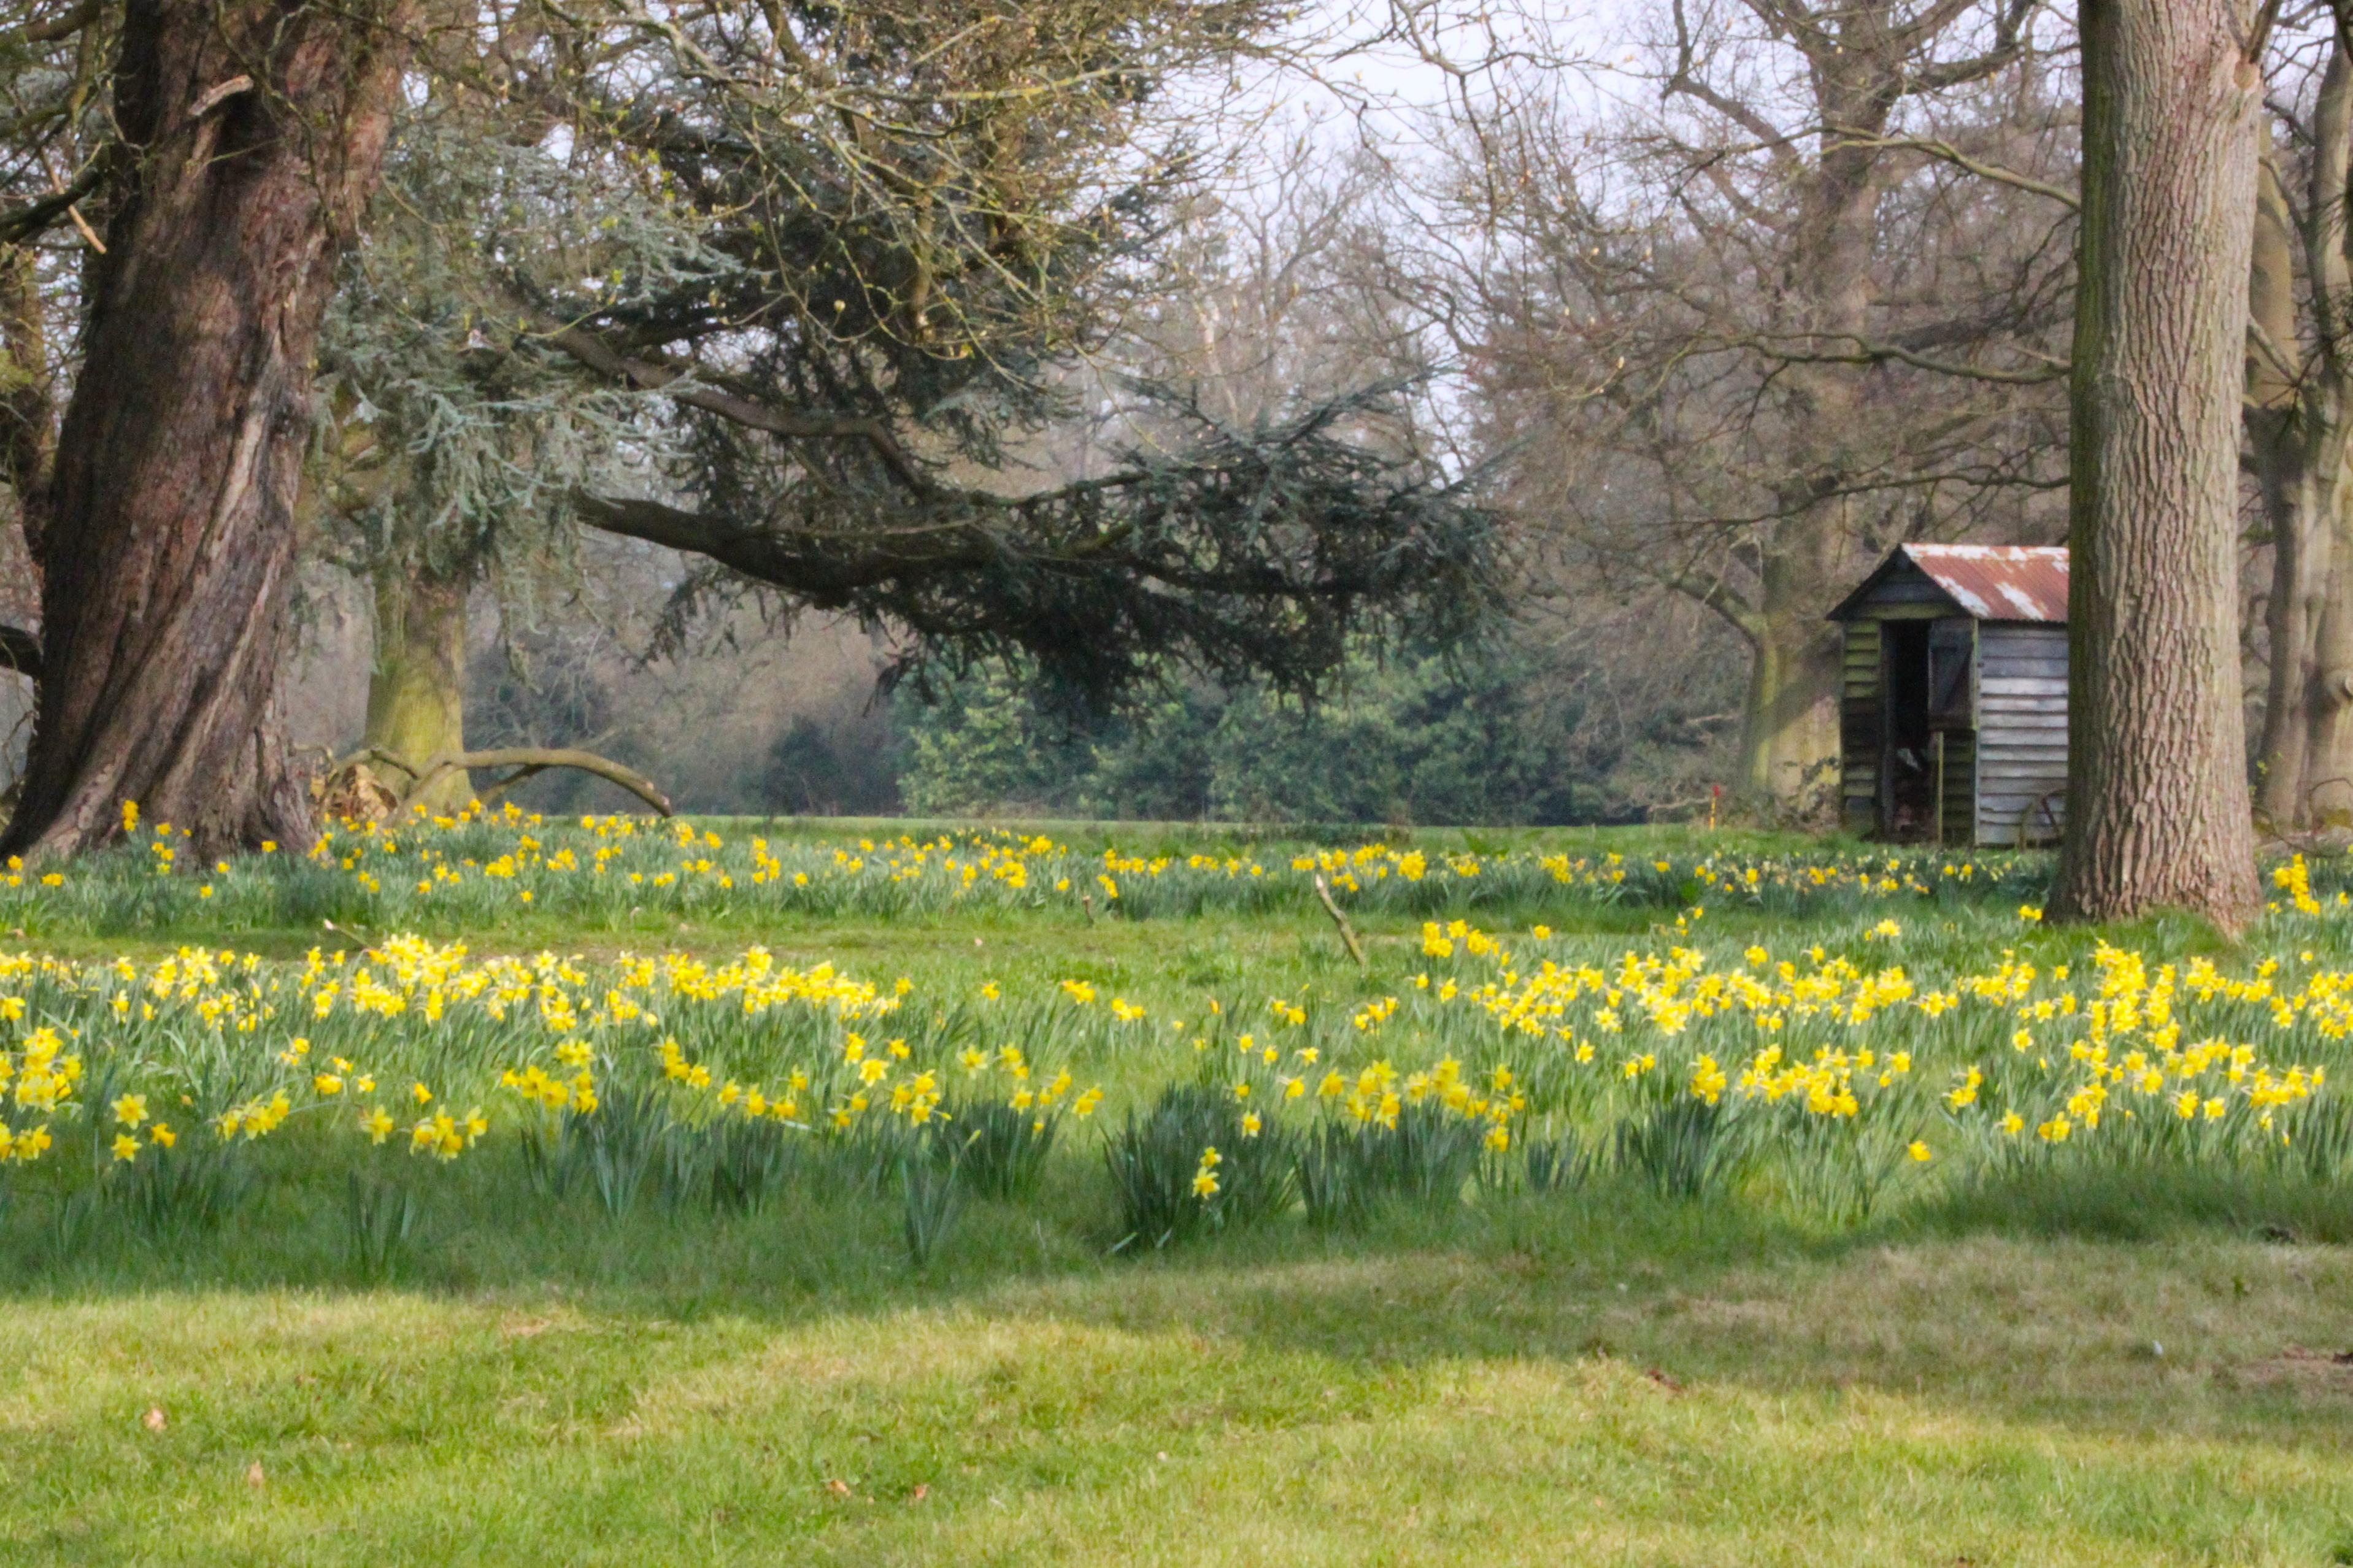 Daffodils in sprightly dance